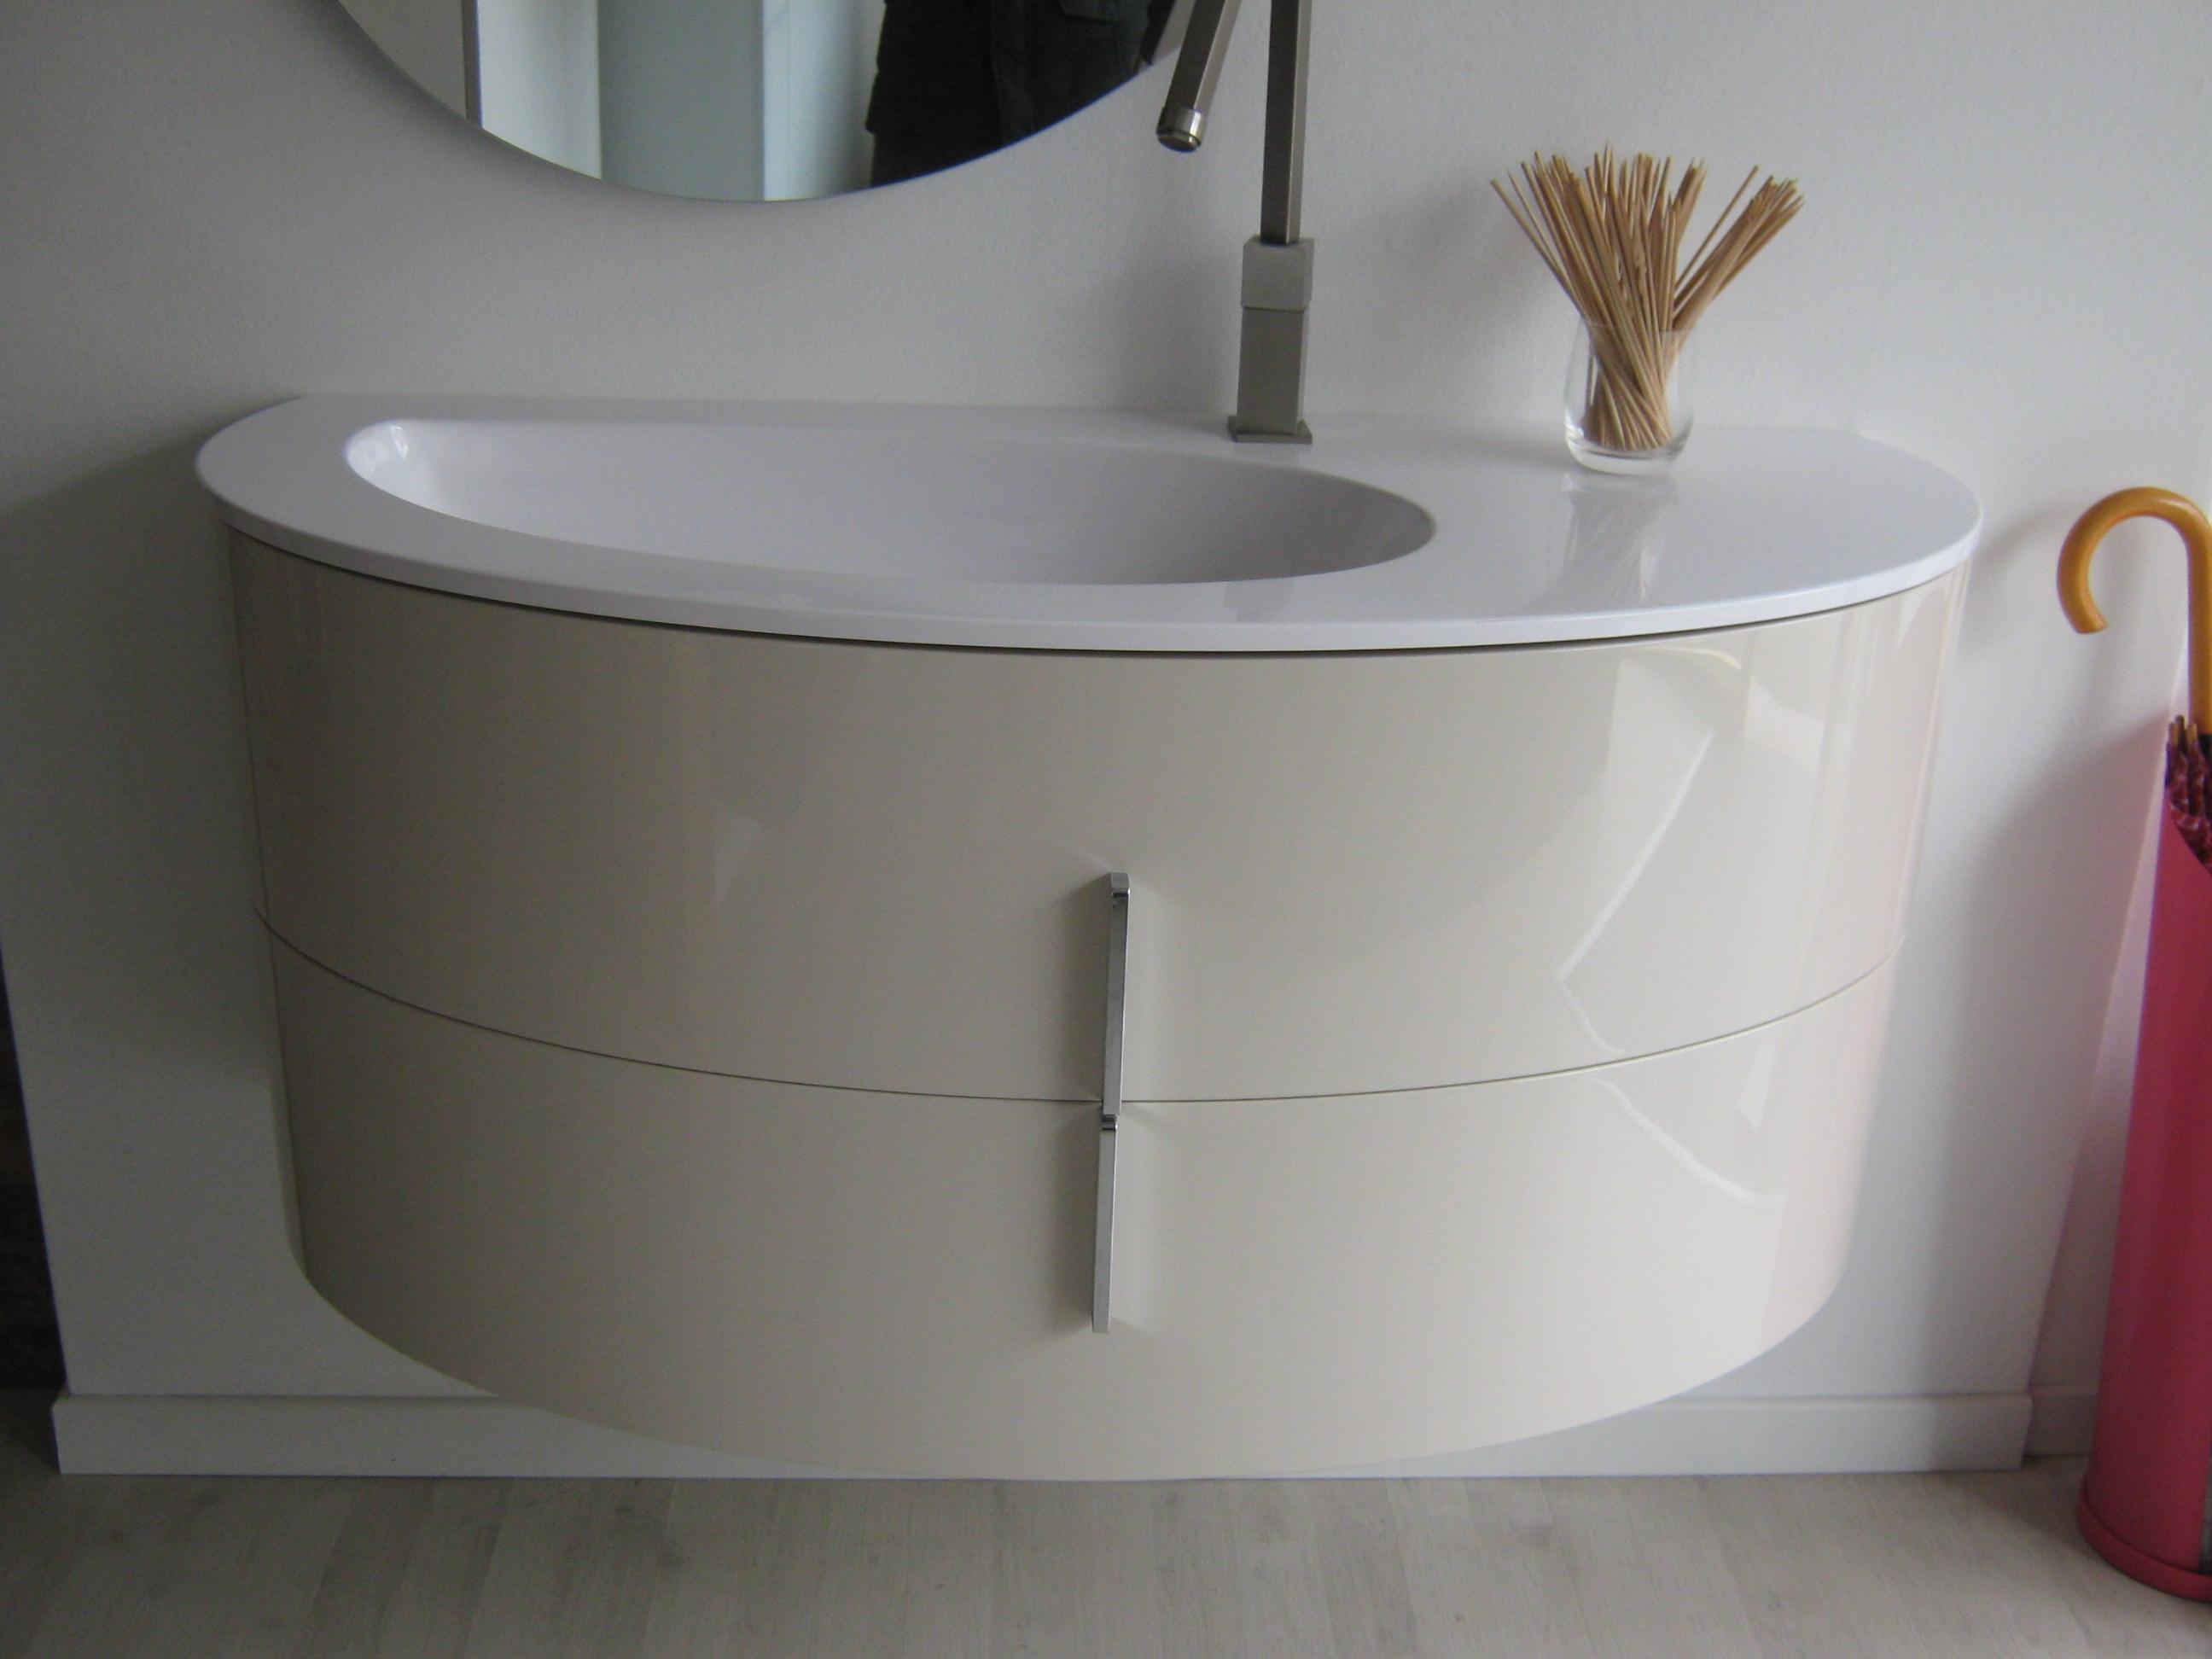 Voffca.com  Carrello Cucina Legno Bianco Decape